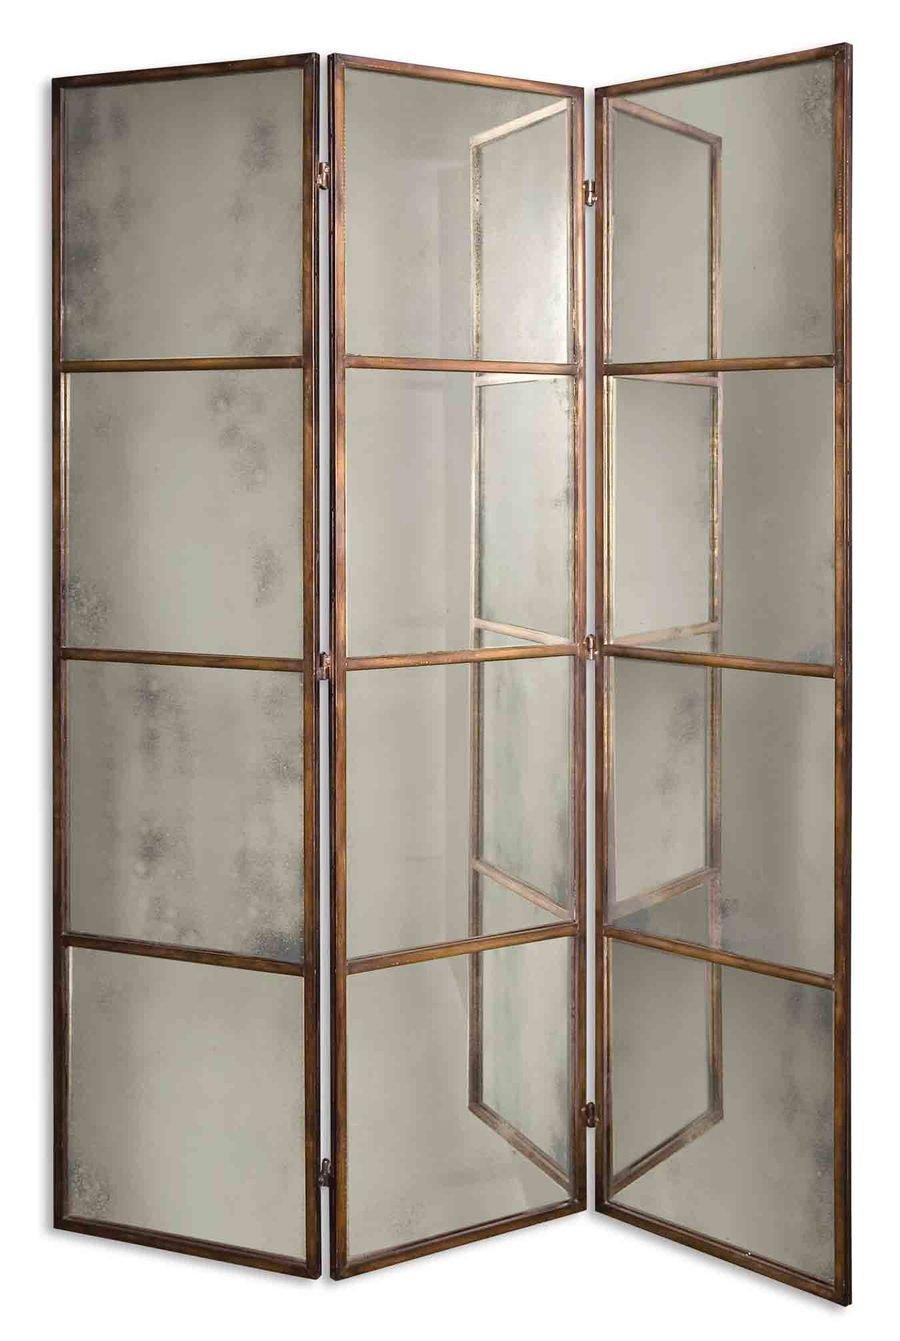 Amazoncom 80 x 63 Avidan Mirrored 3 Panel Room Divider Wall